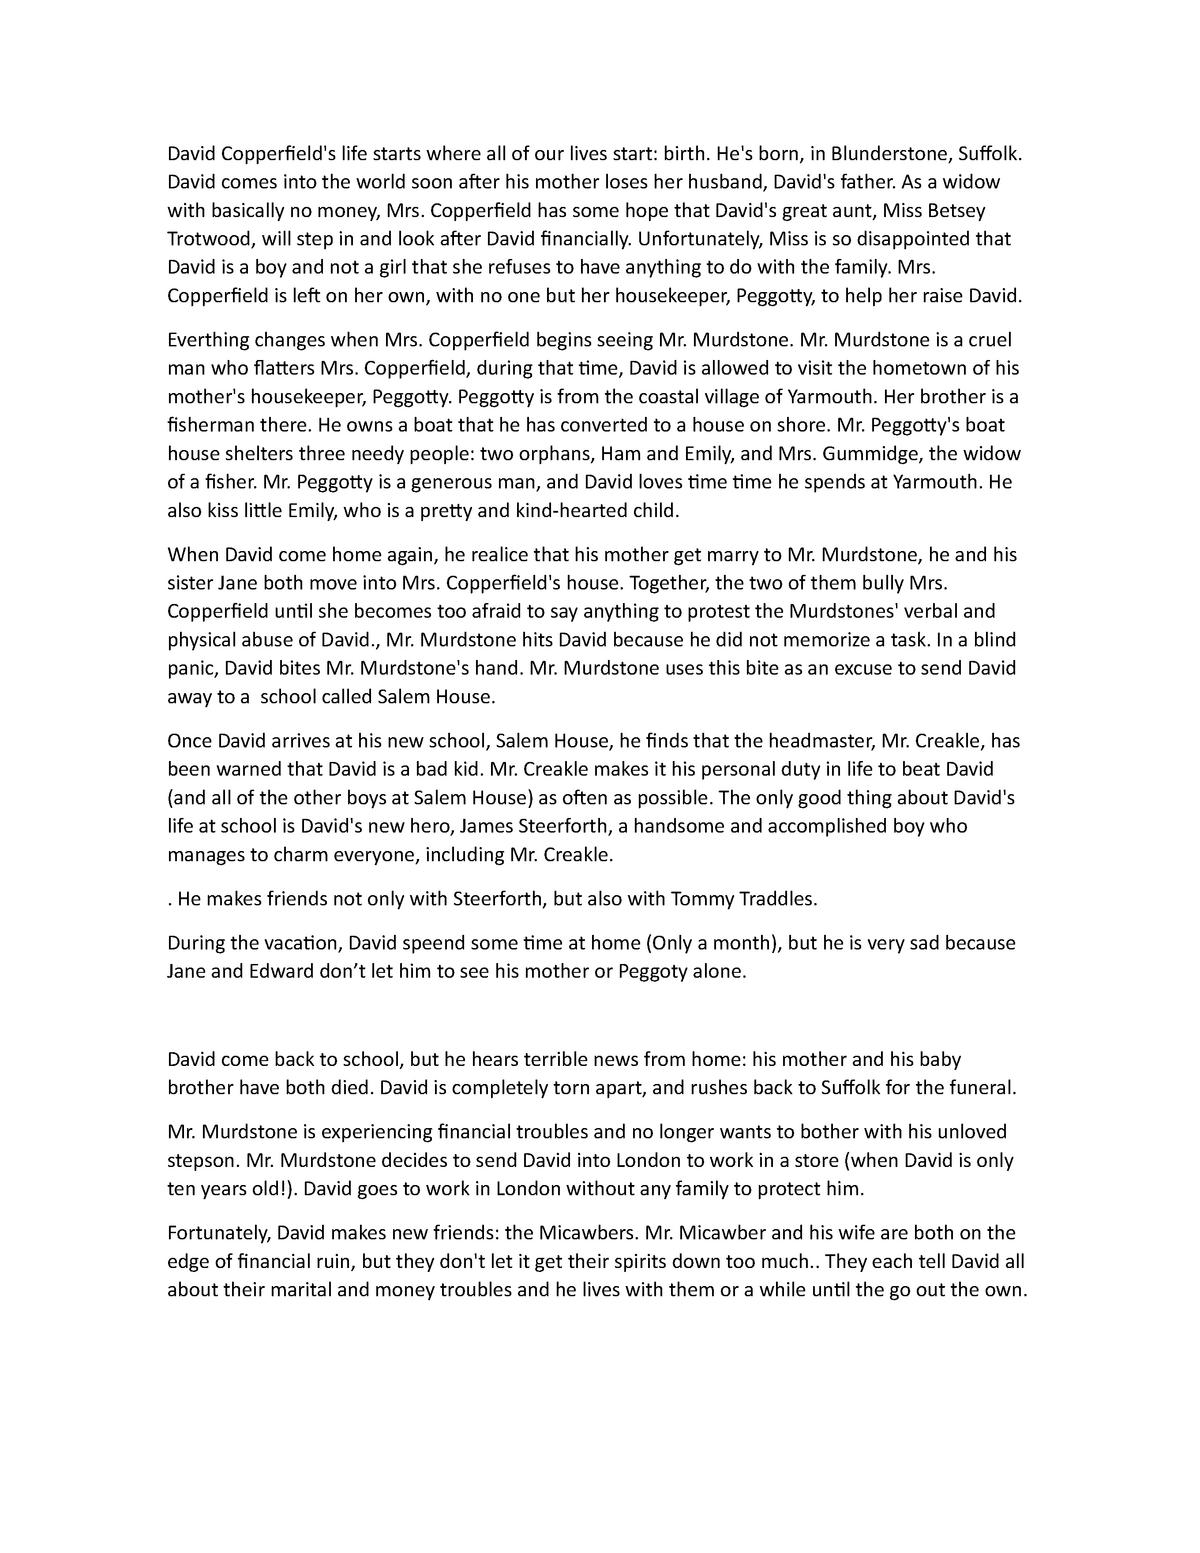 D - Summary David Copperfield - Inglés Intensivo I 2026054